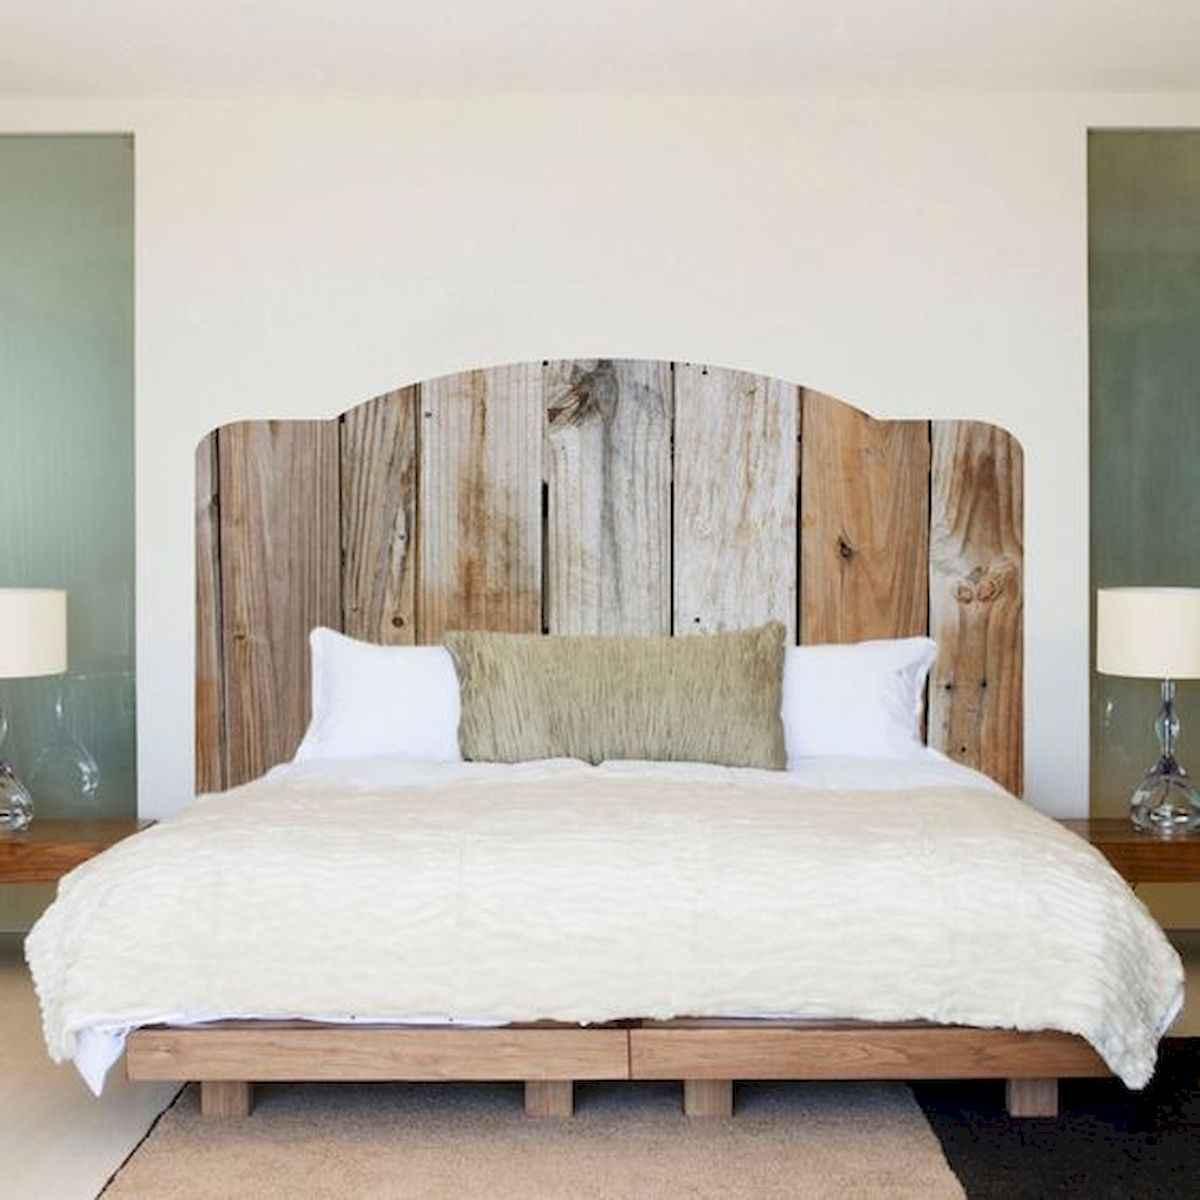 60 Most Creative Diy Projects Pallet Headboards Bedroom